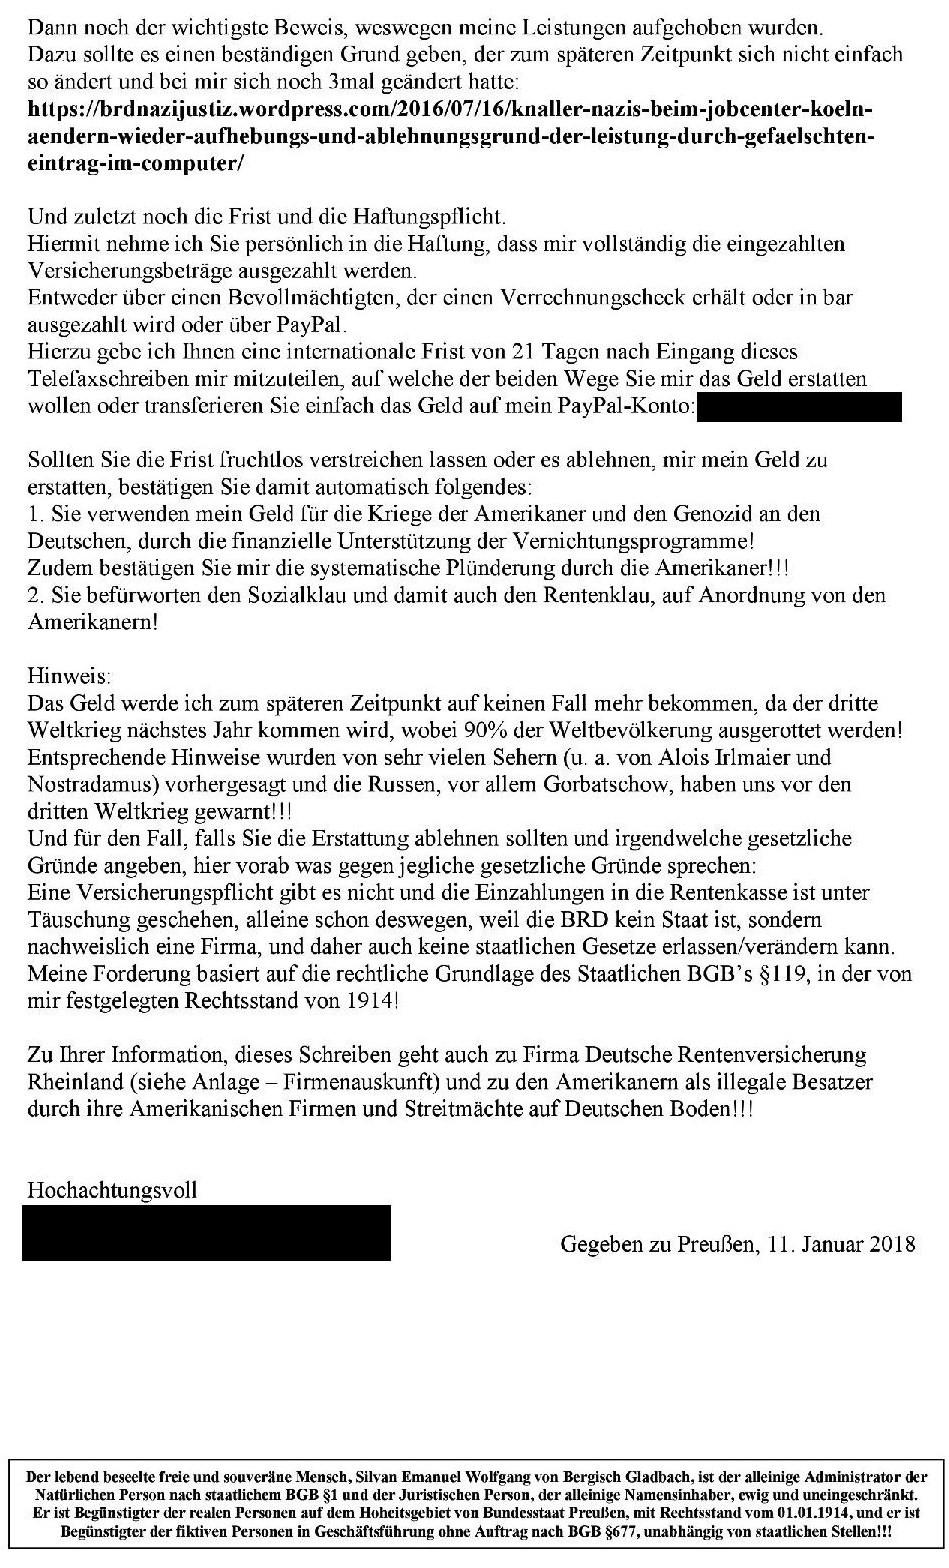 Kölner Nazi Justiz Brd Nazi Justiz Von Dj Silvan